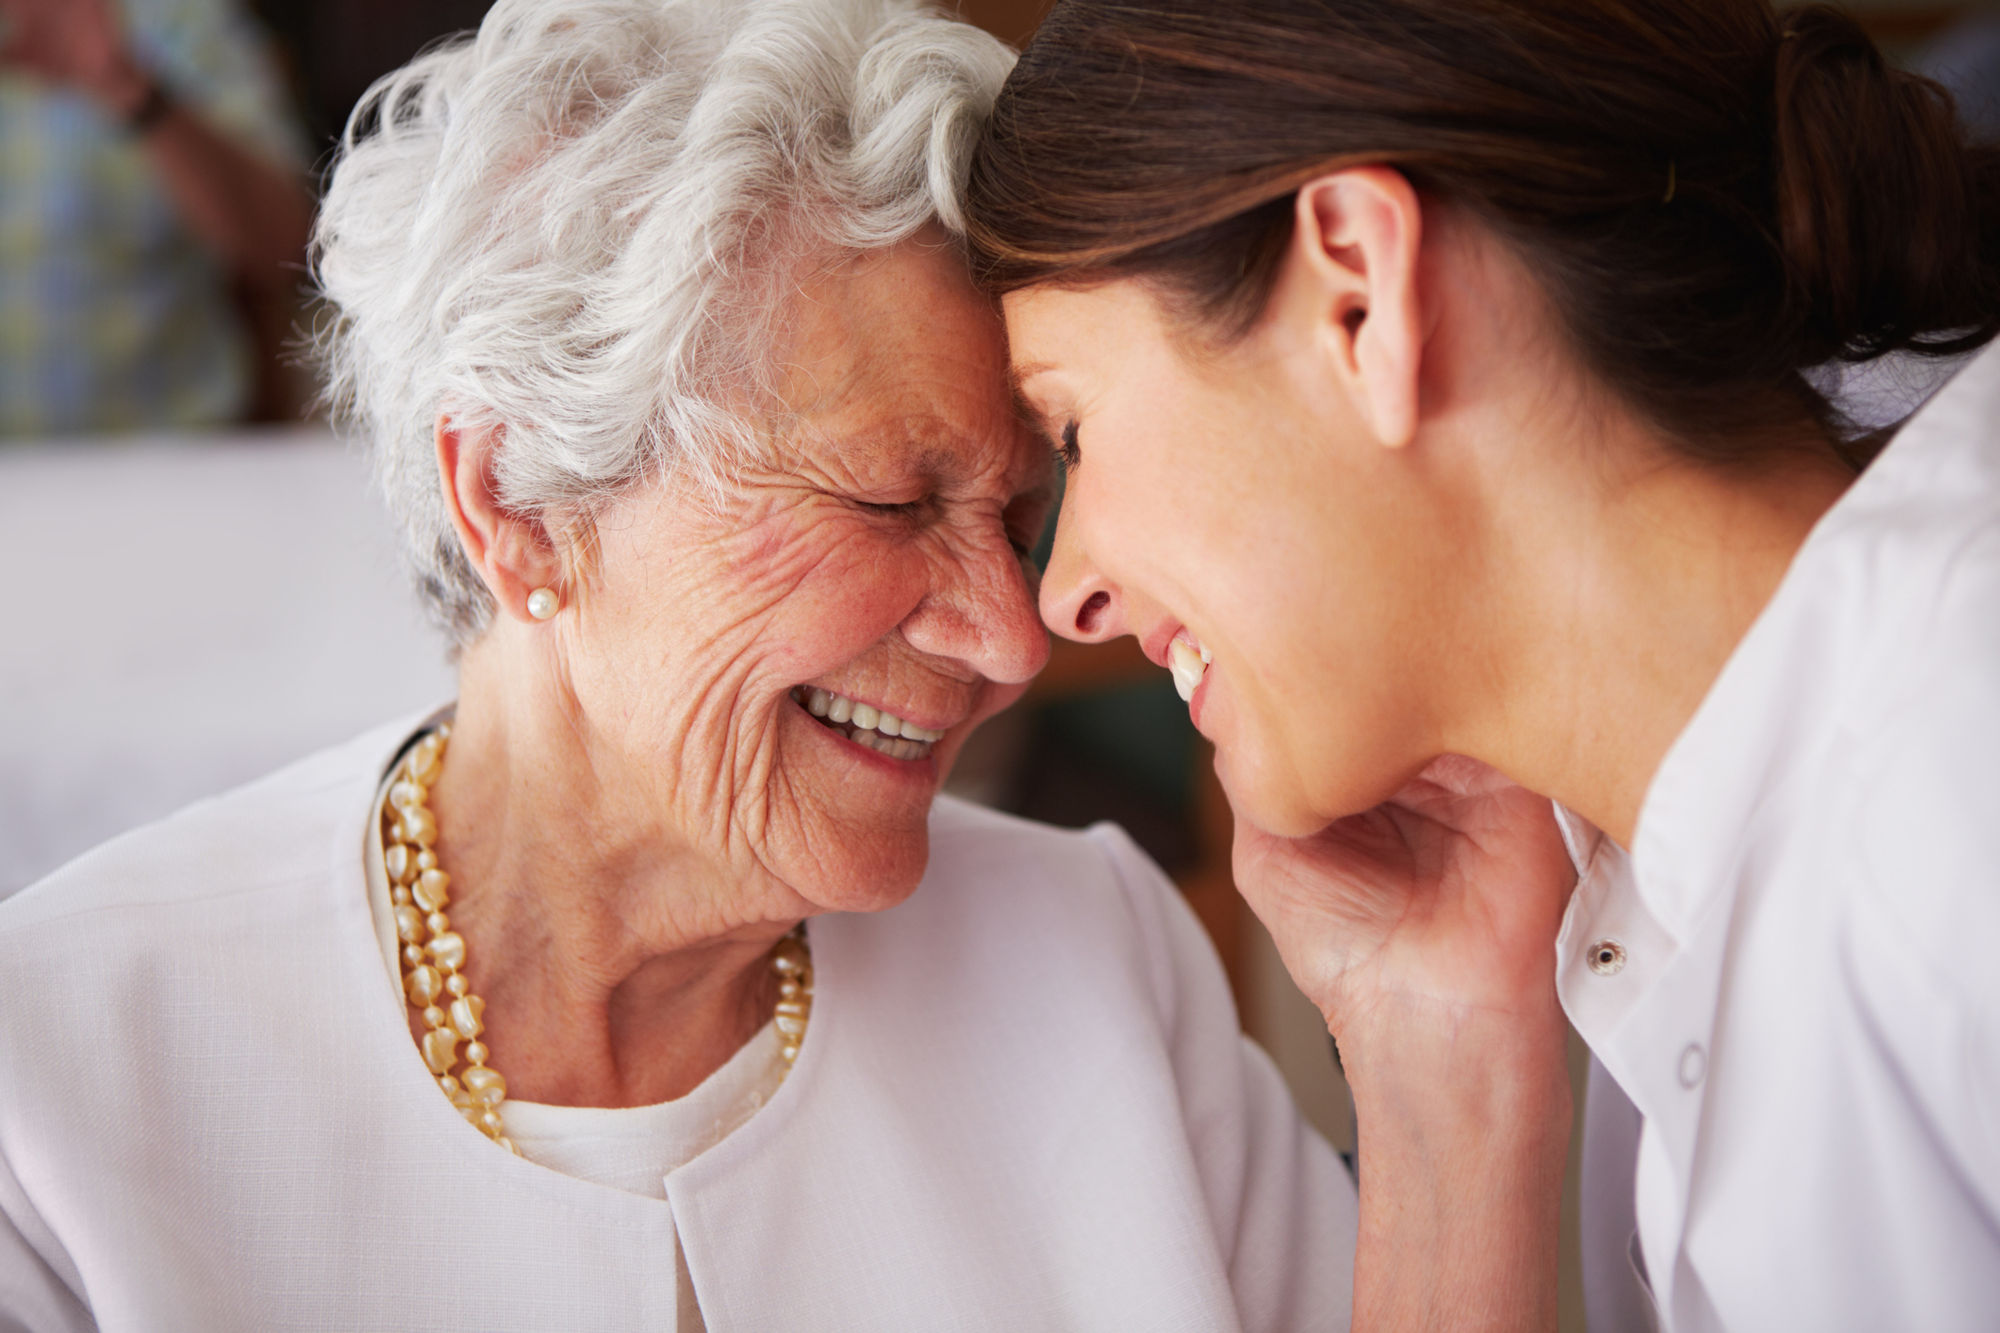 An elderly woman affectionately thanking her nurse